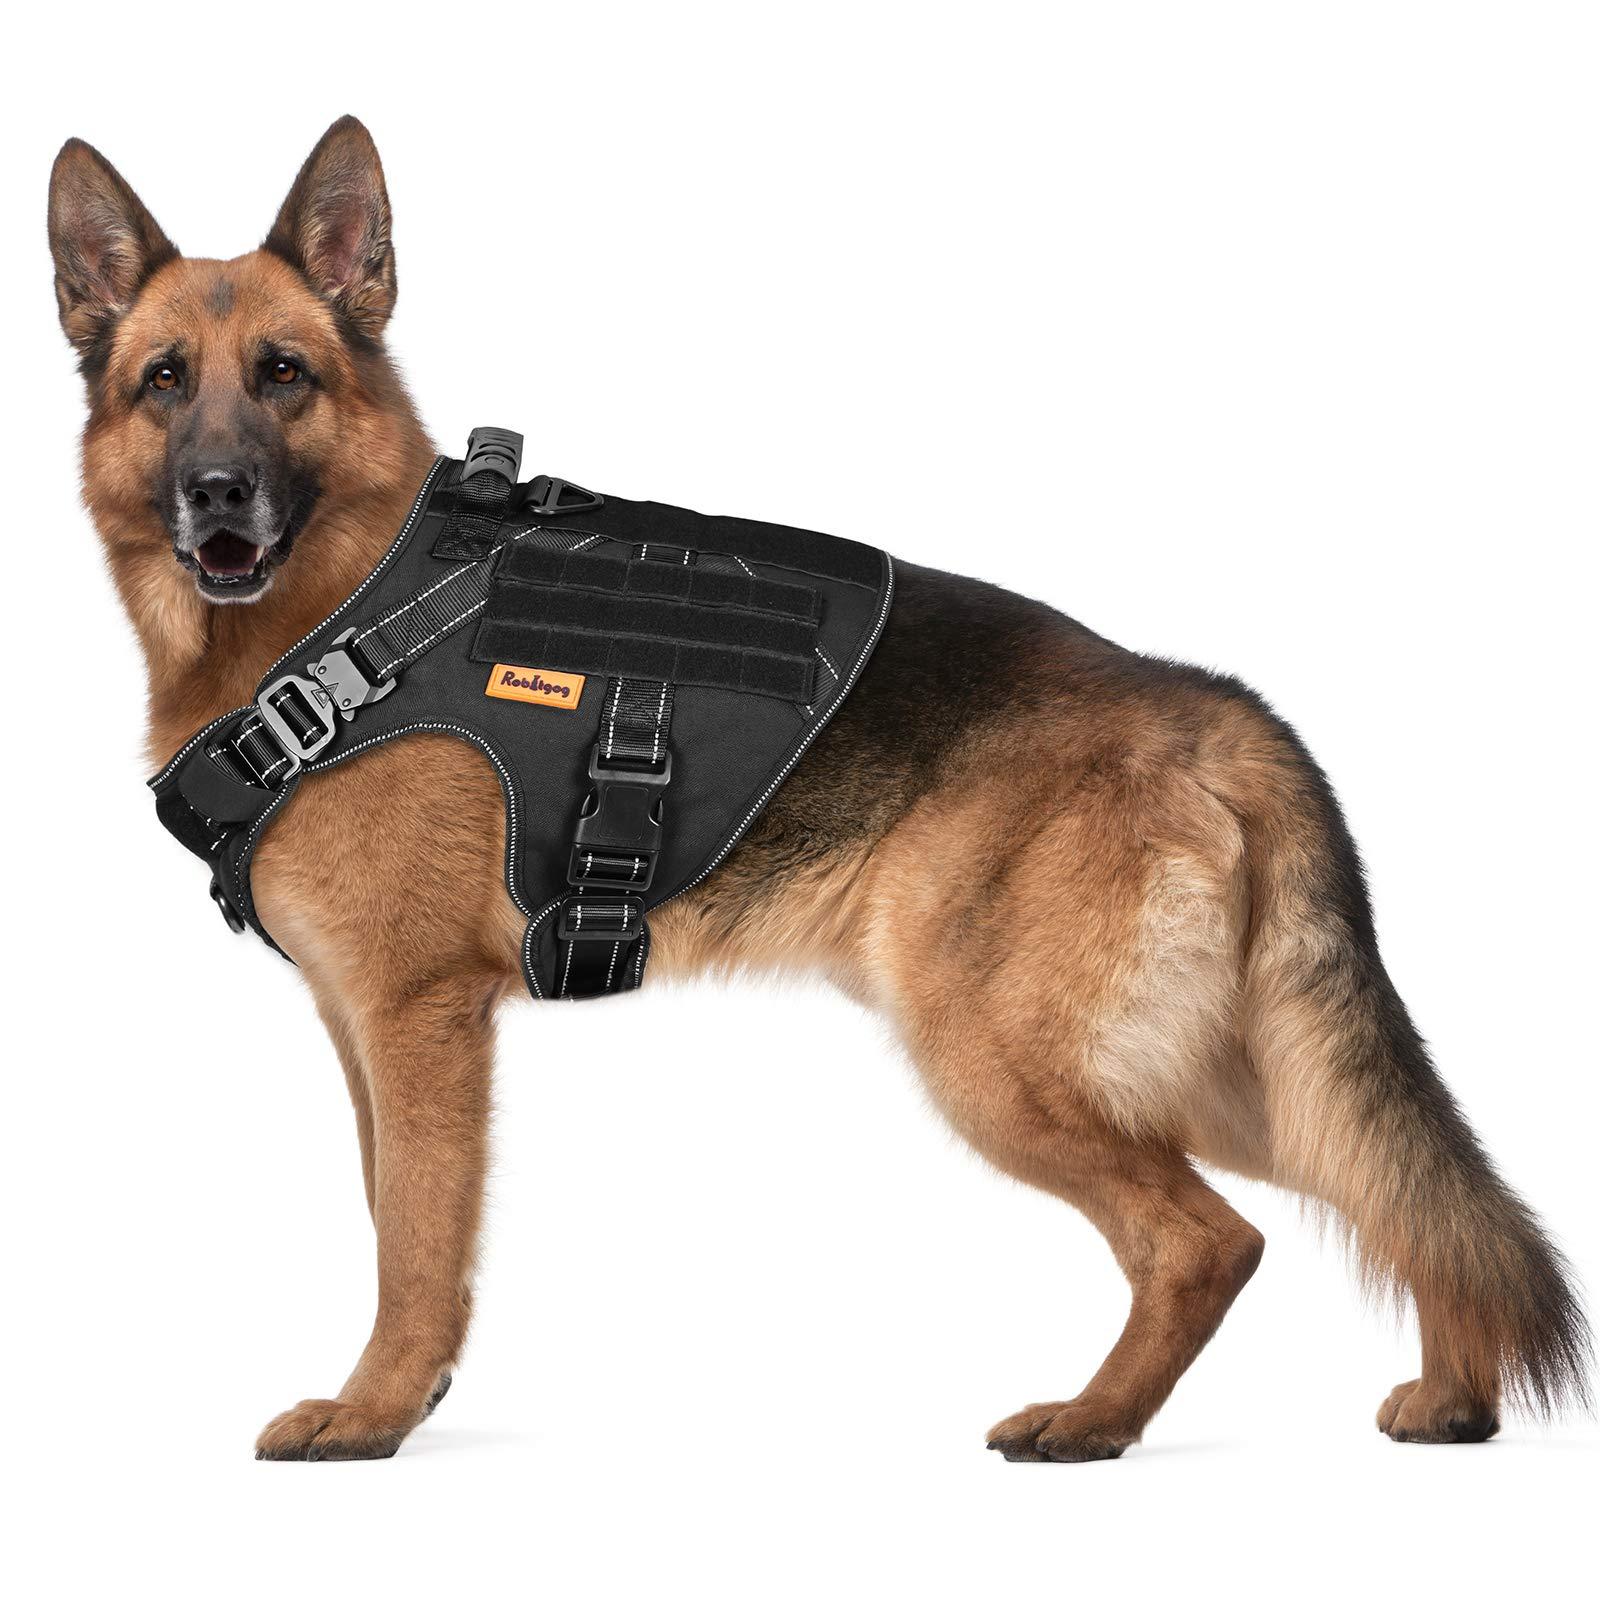 ROBITGOG Tactical Dog Harness Reflective Breathable Service Dog Pet Vest Easy Control Handle 2 Metal Buckle Suitable for Medium/Large Tactical Dog